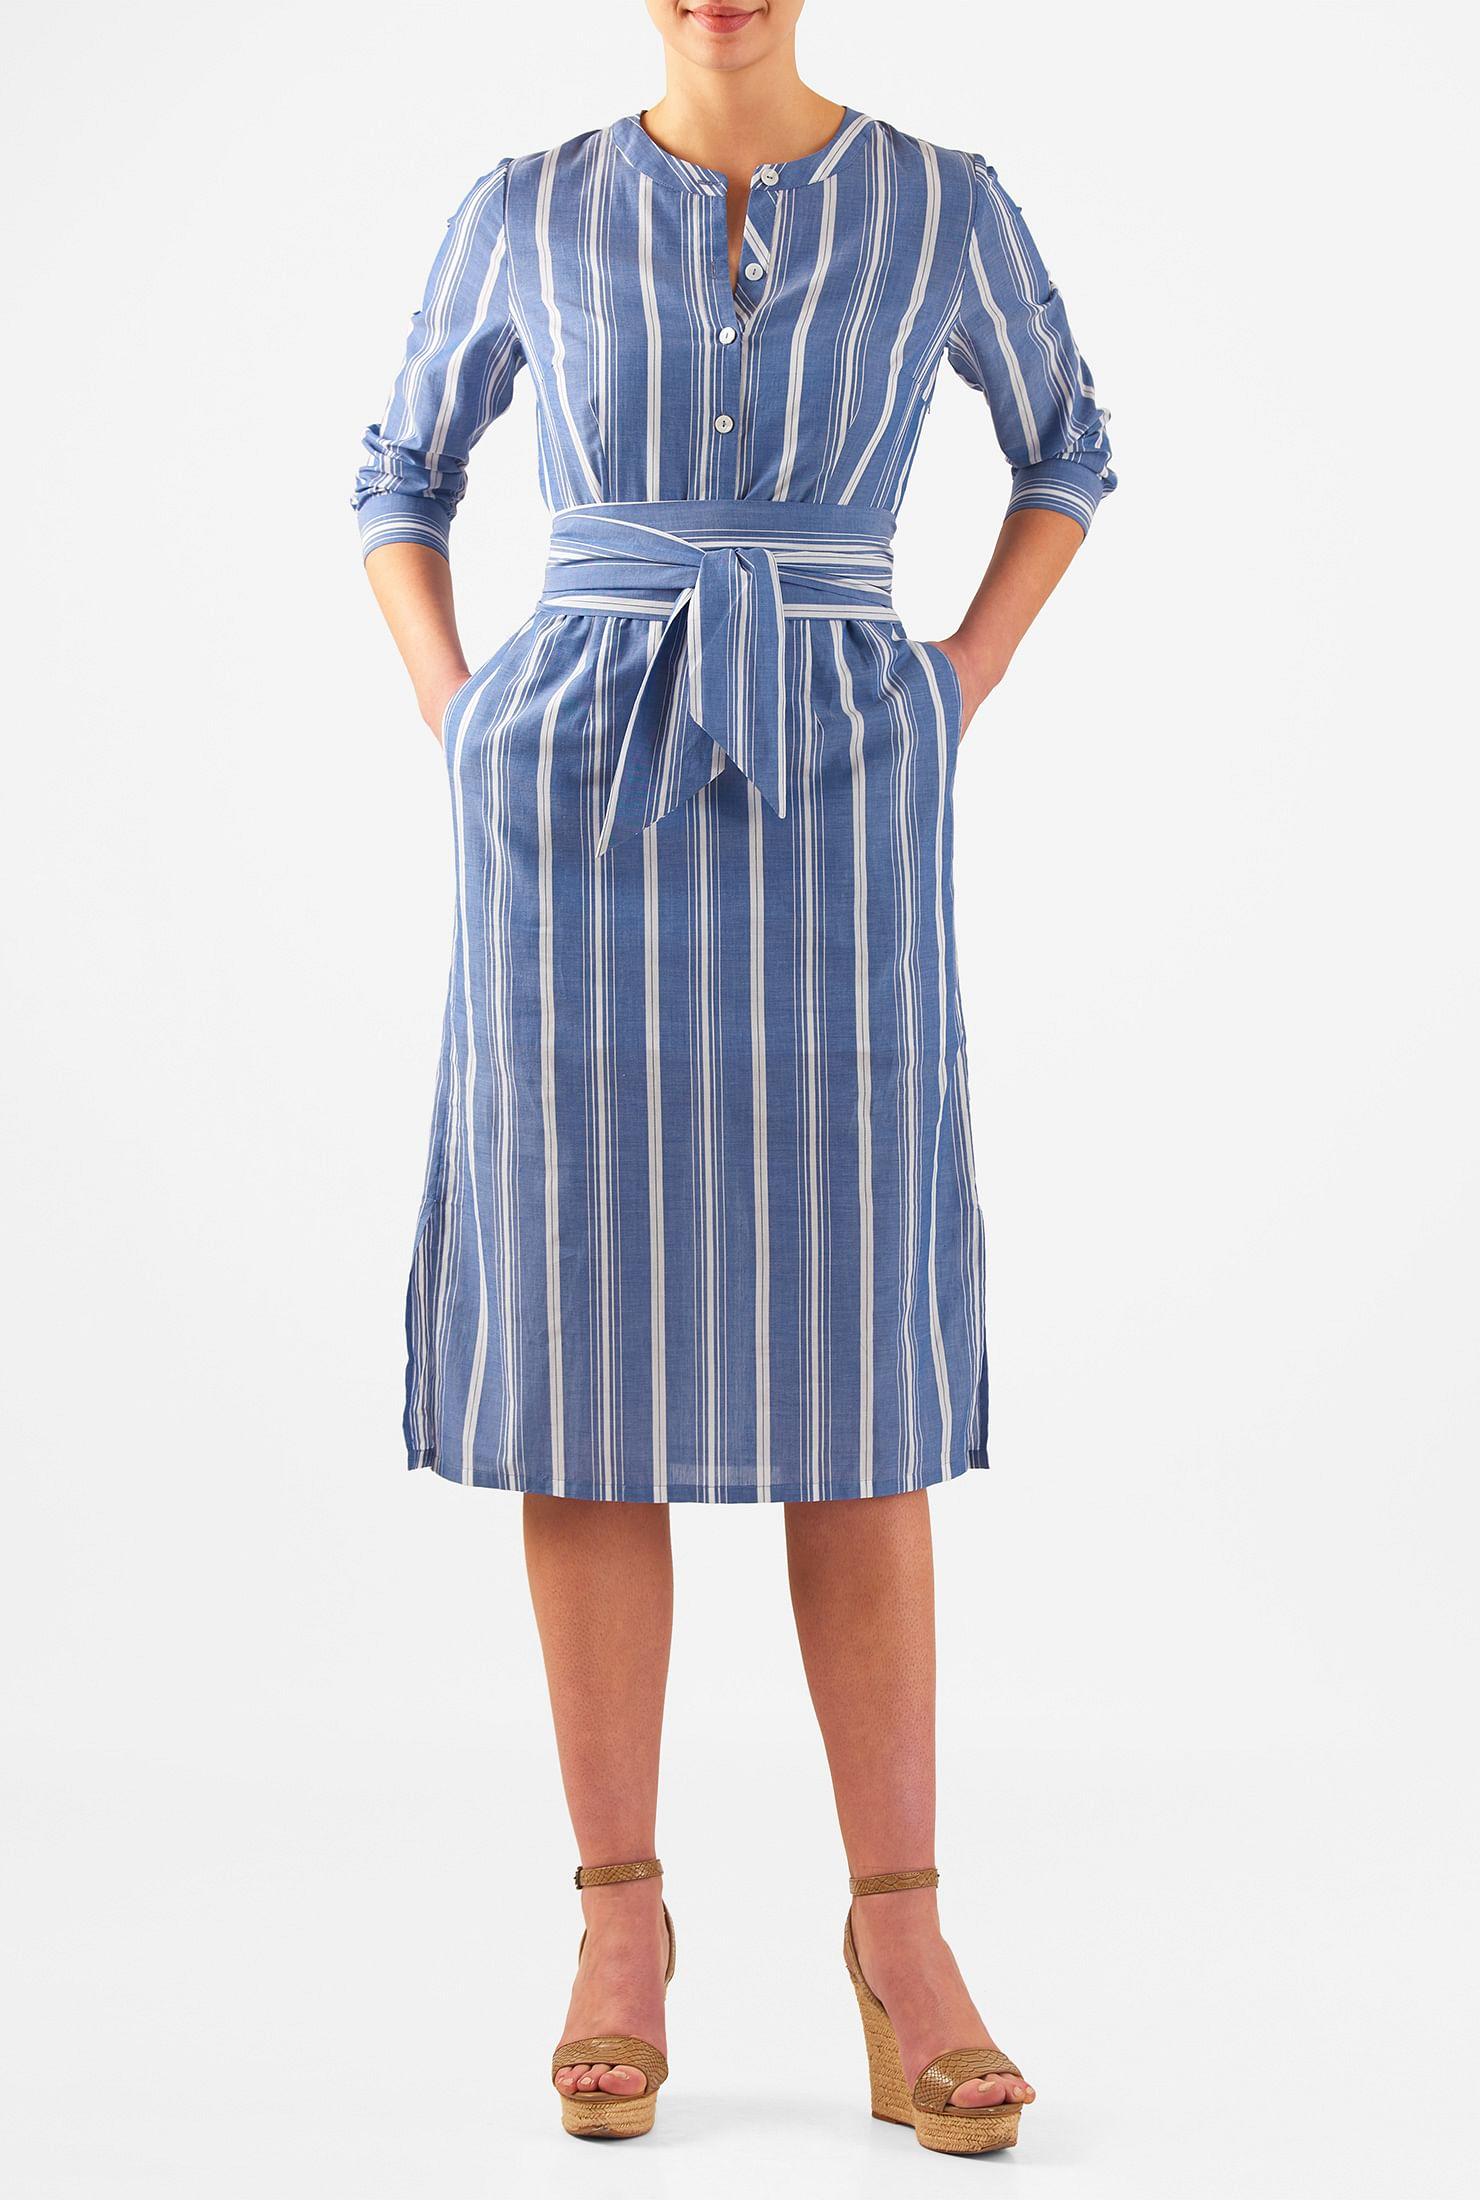 Chambray Dress with Belt